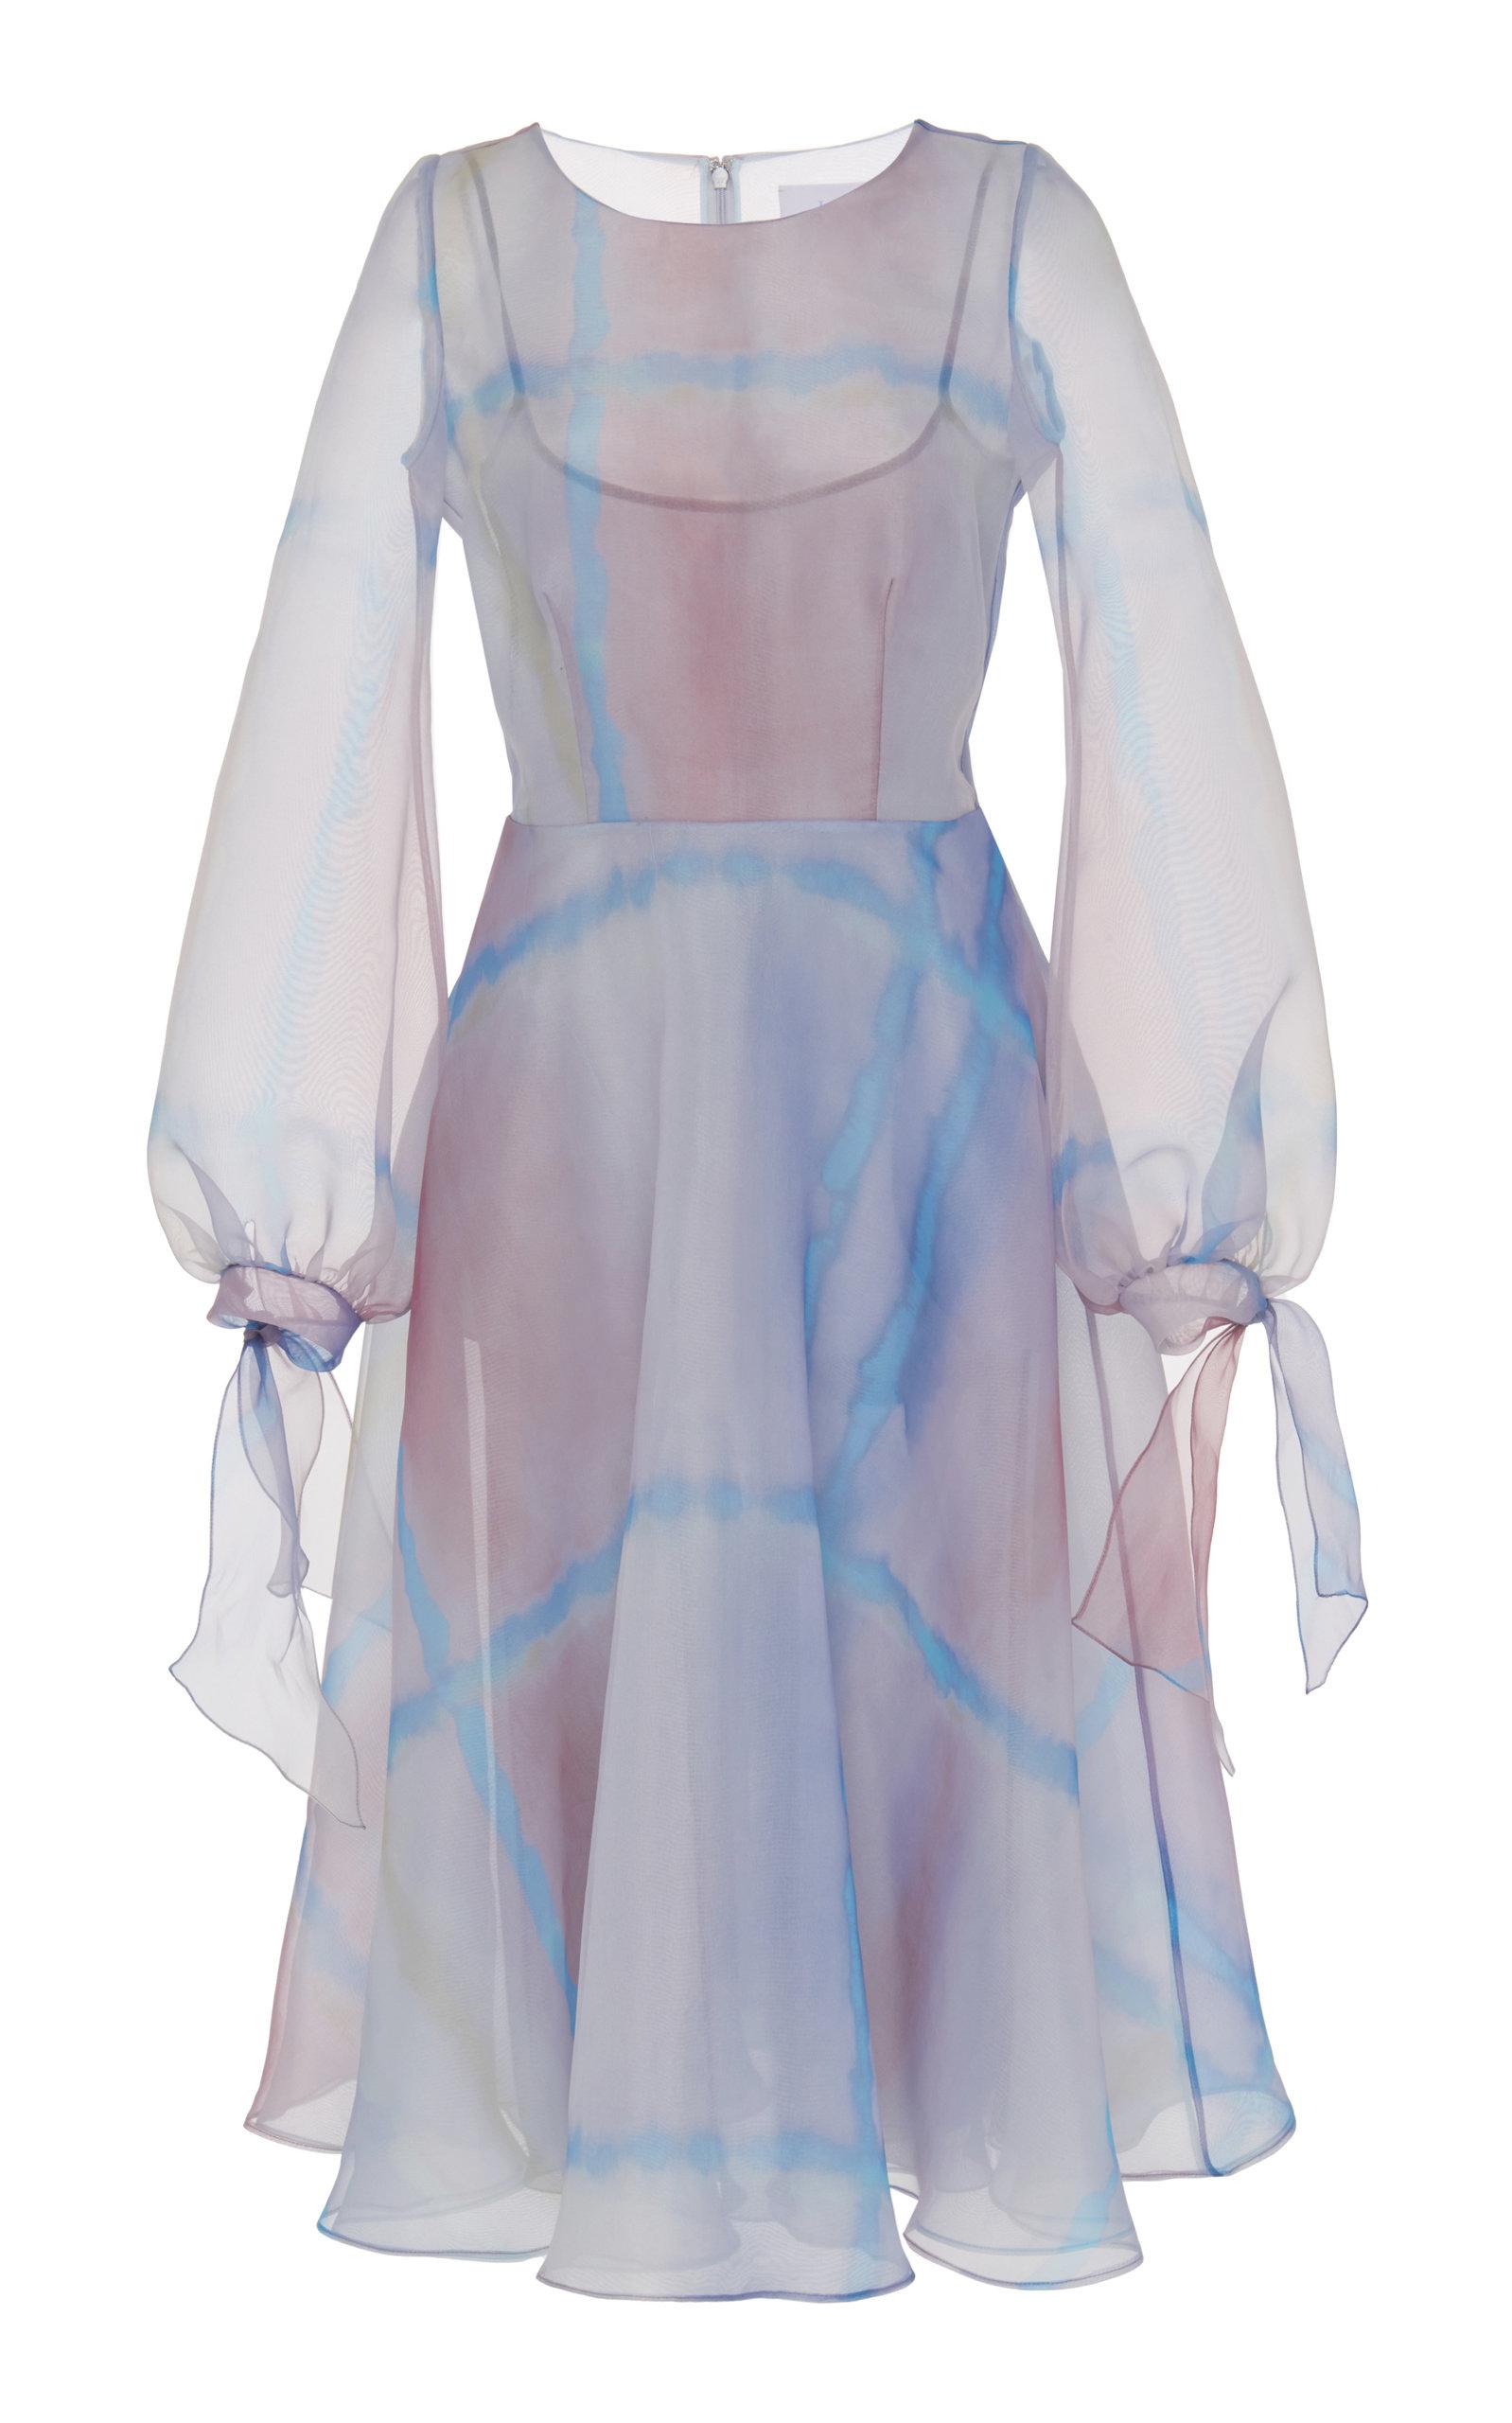 1862d5d9ead52 Watercolor Midi Dress by Luisa Beccaria | Moda Operandi